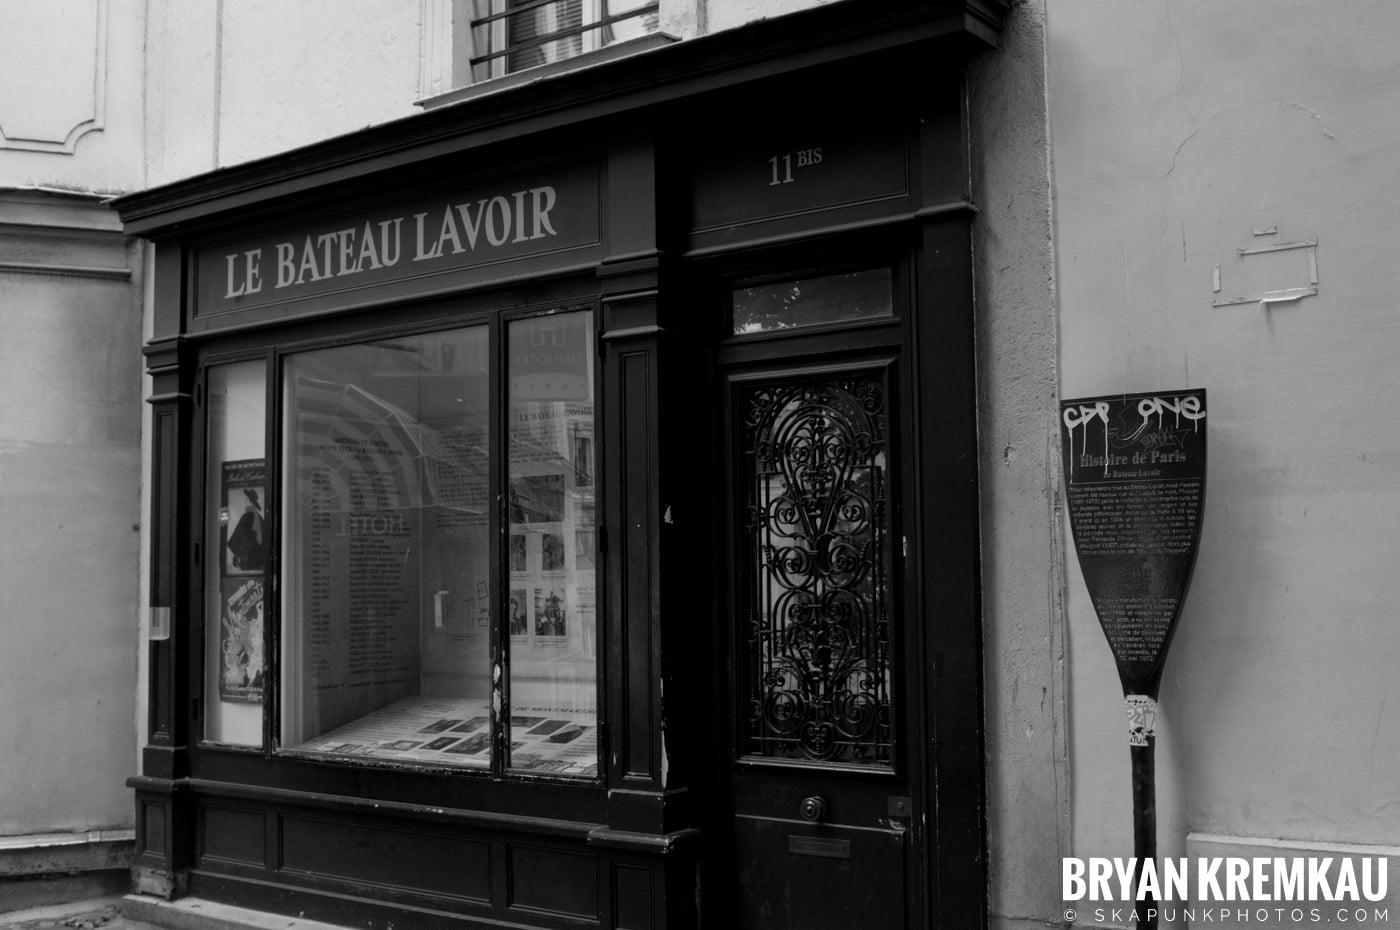 Paris, France Honeymoon - Day 6 - 7.23.11 (21)